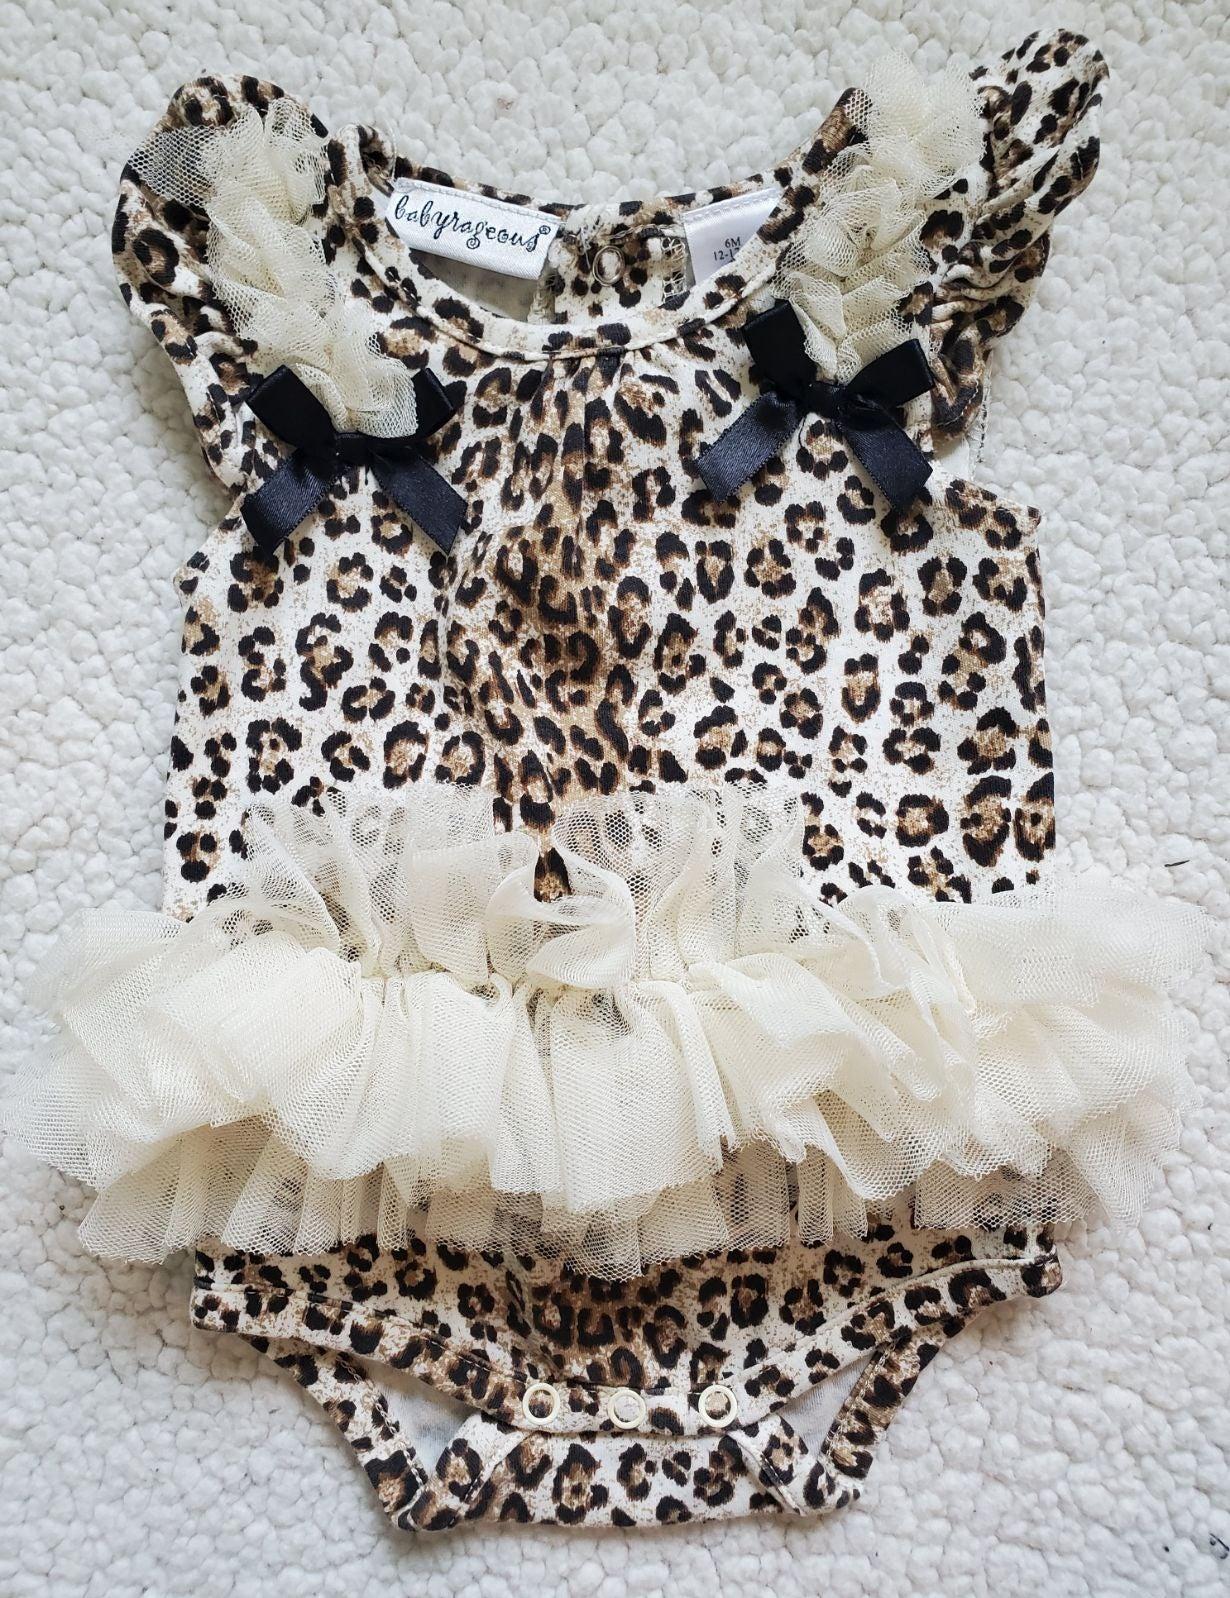 Leopard Print Baby Romper